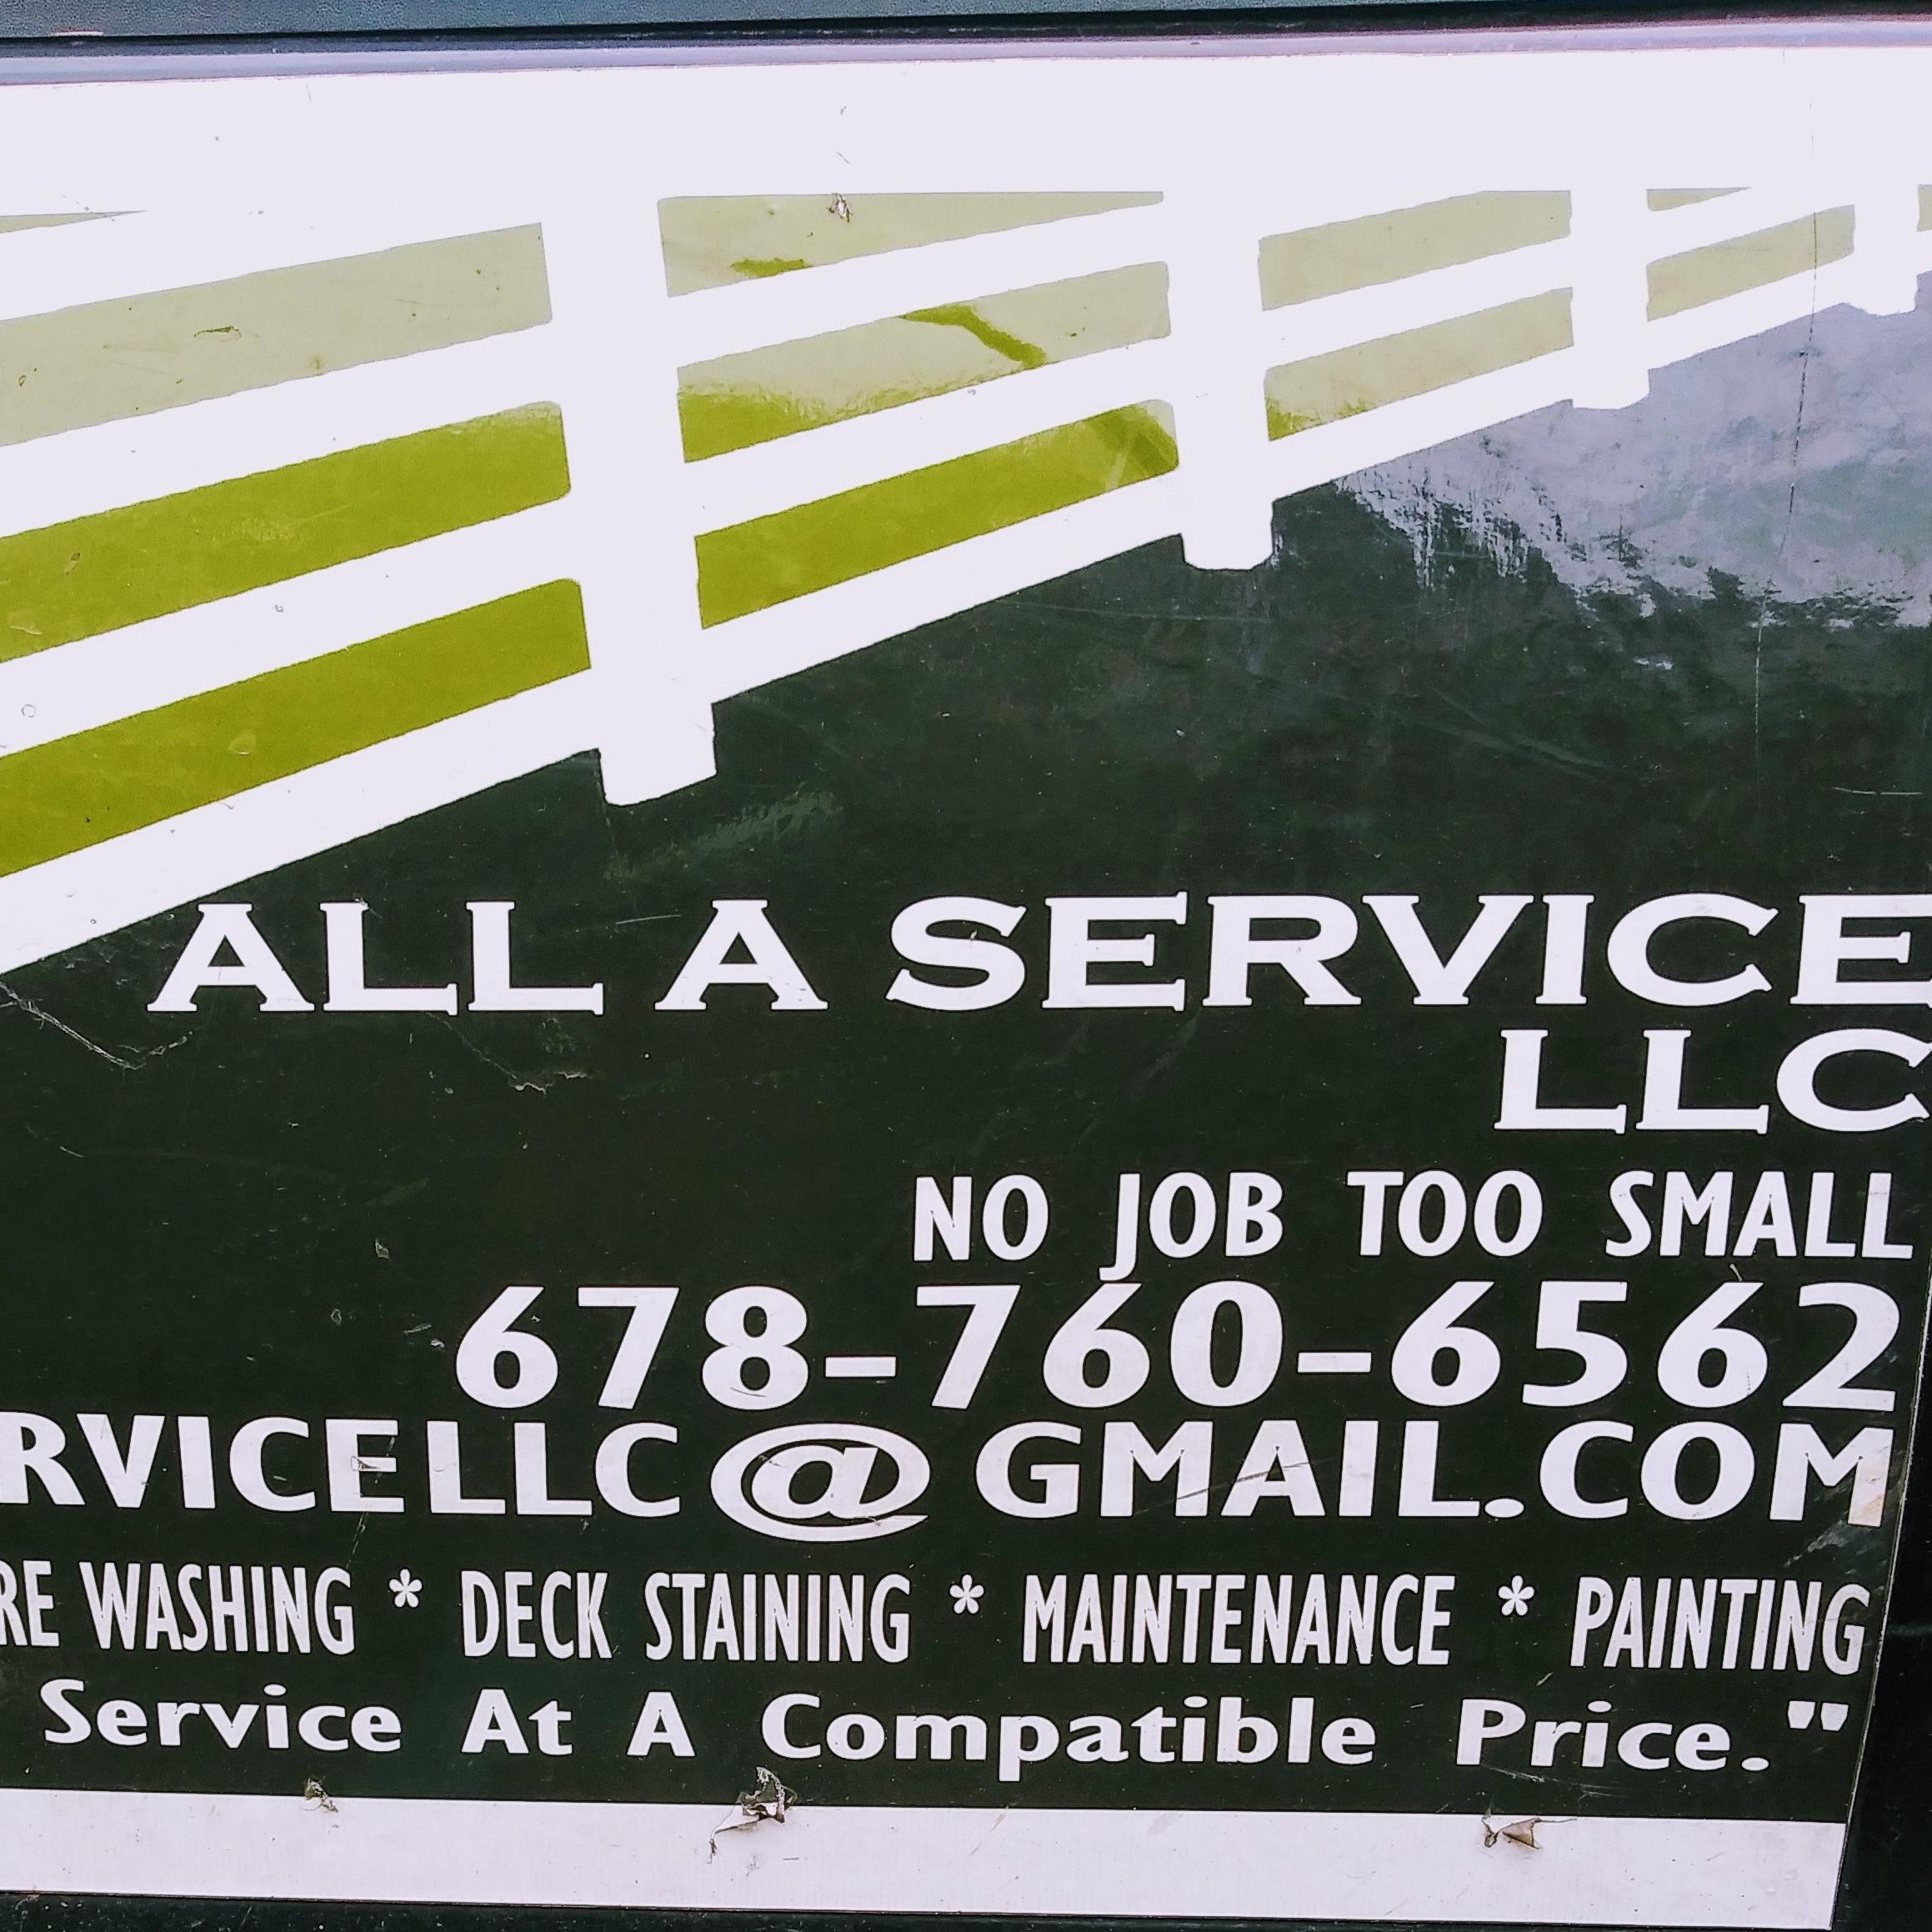 All A Service, LLC